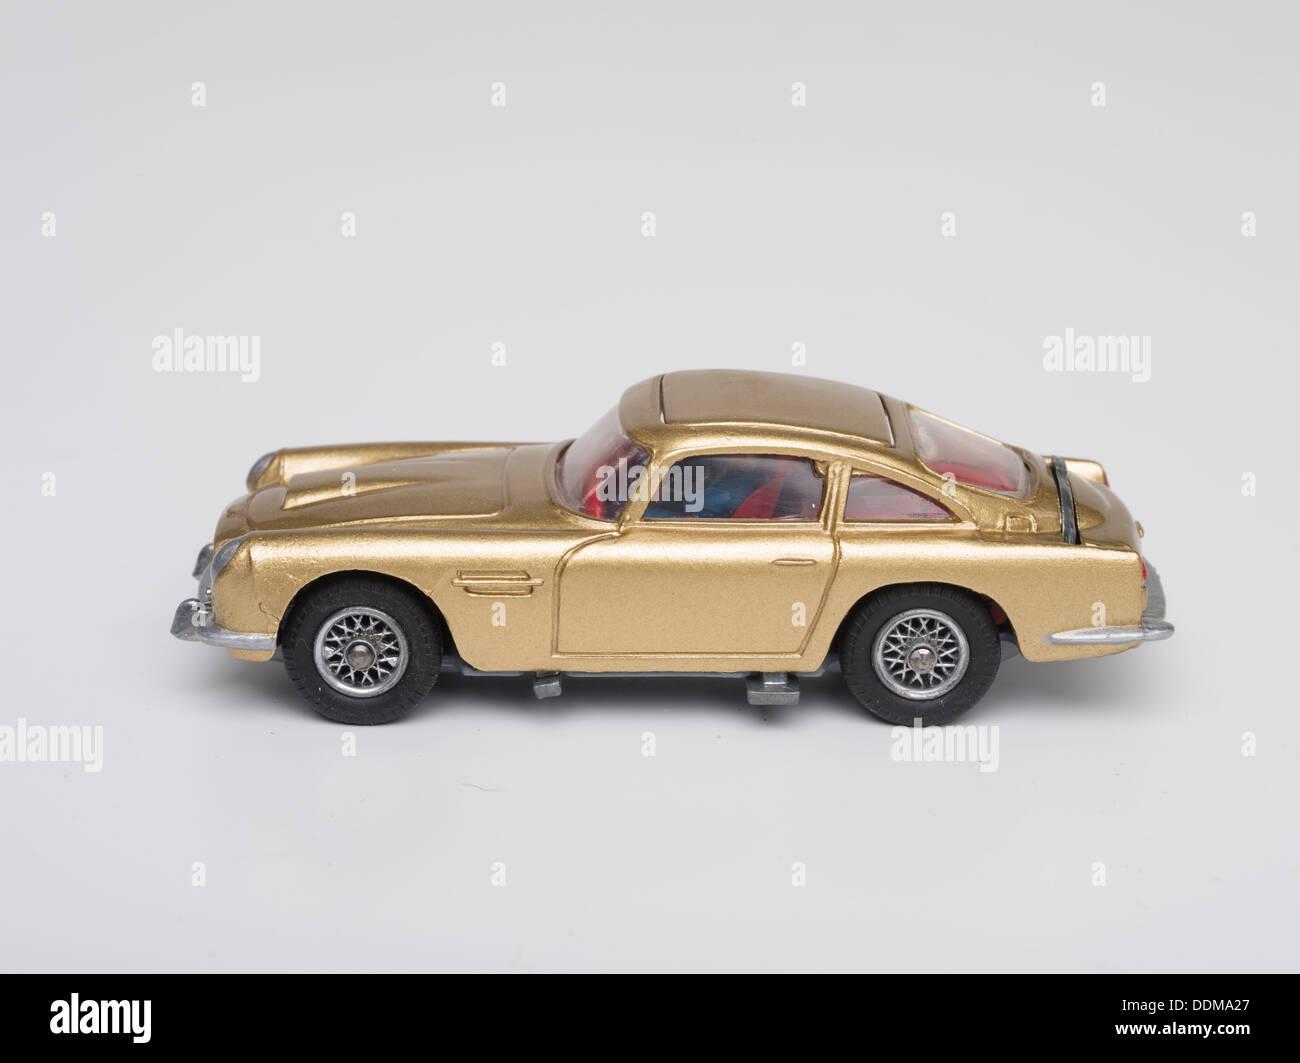 Corgi Toys 261 Cast Model Of James Bond S Aston Martin Db5 In Goldfinger Mit Schleudersitz Produziert Im Jahr 1965 Stockfotografie Alamy